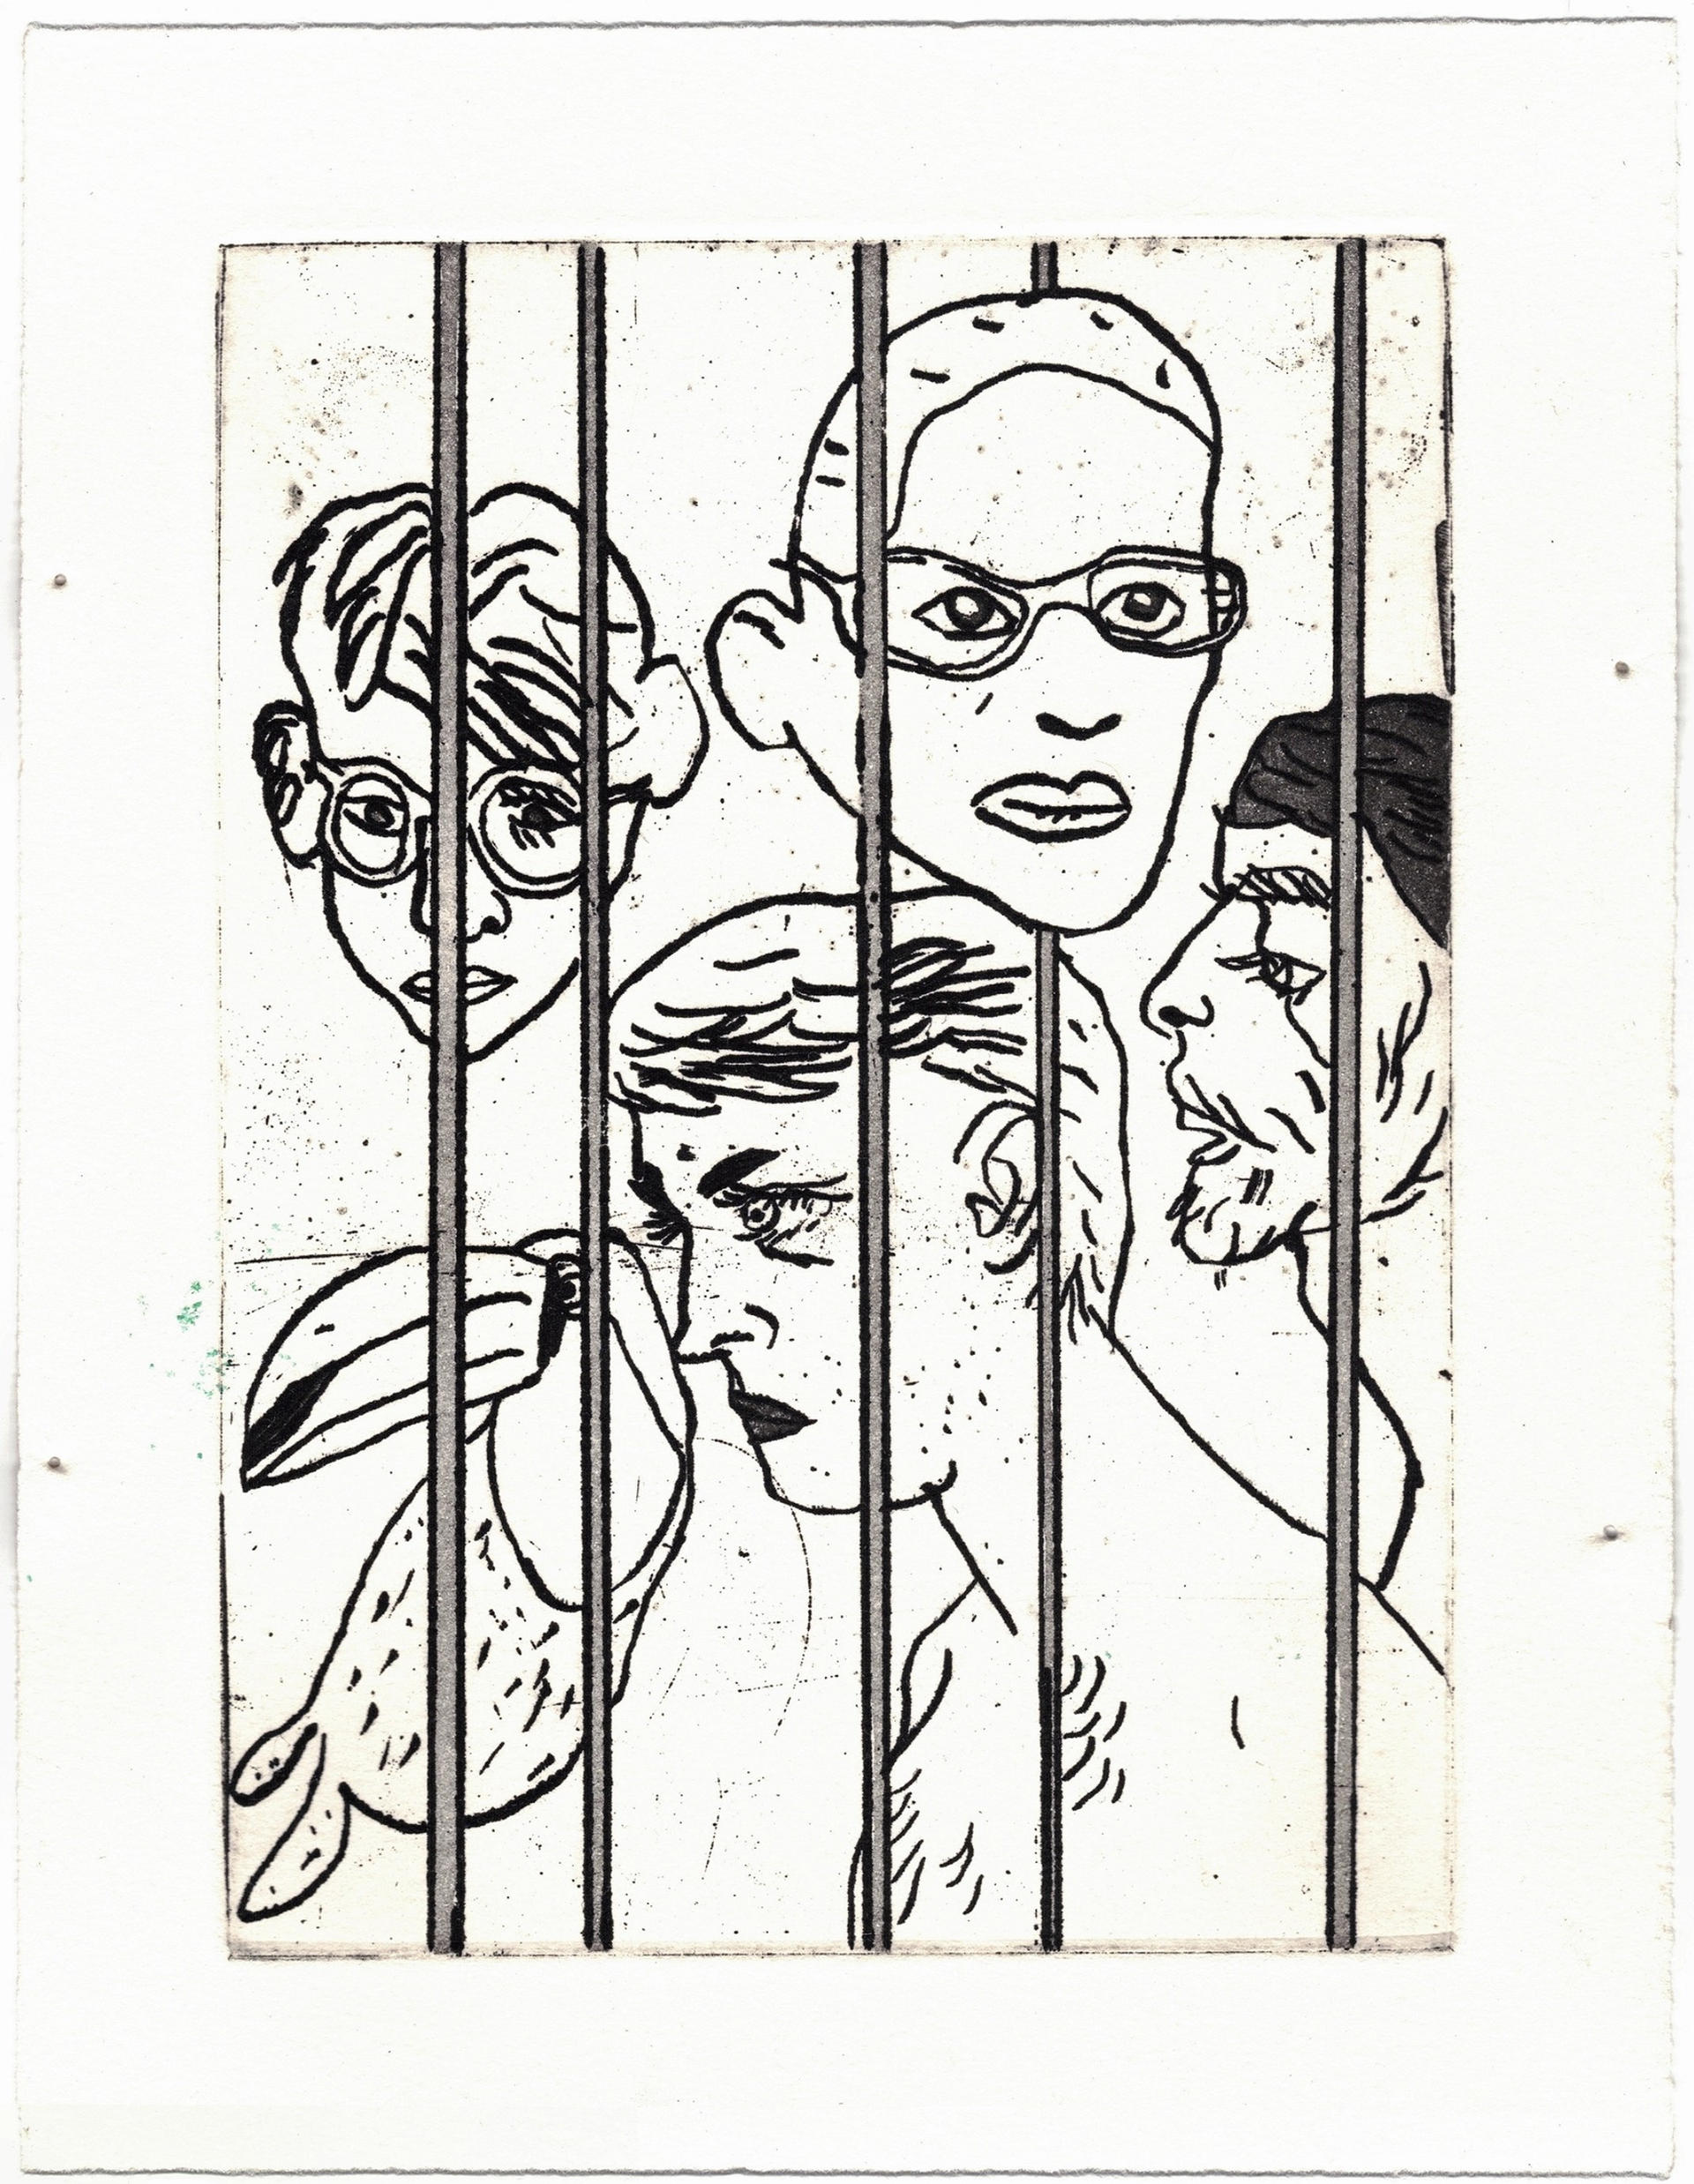 Jailbirds - Proof #1